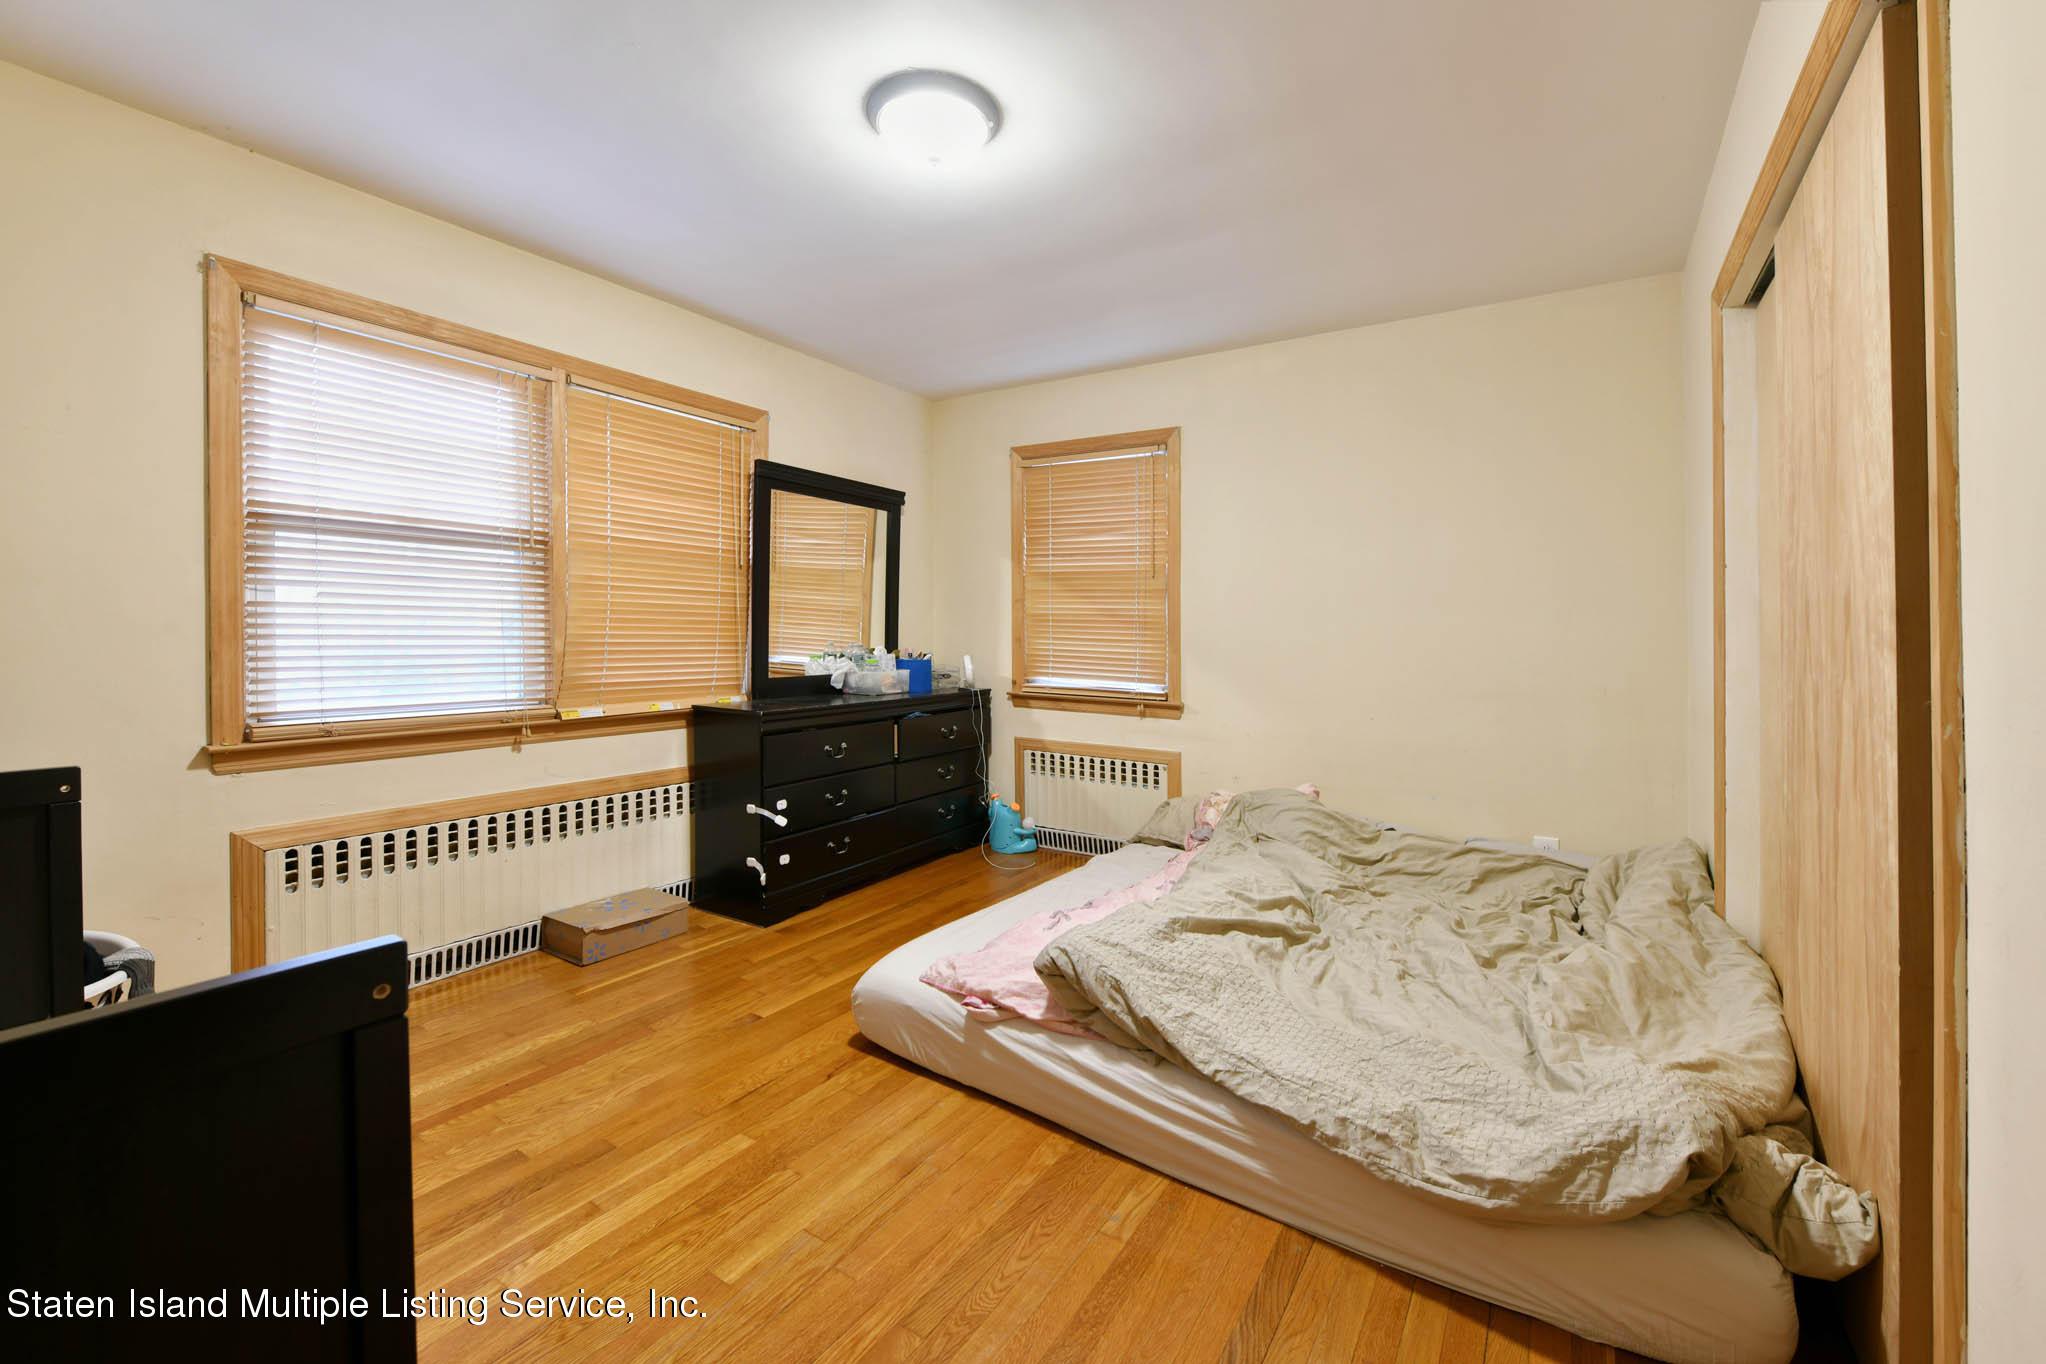 Single Family - Detached 110 Ravenhurst Avenue  Staten Island, NY 10310, MLS-1143189-11